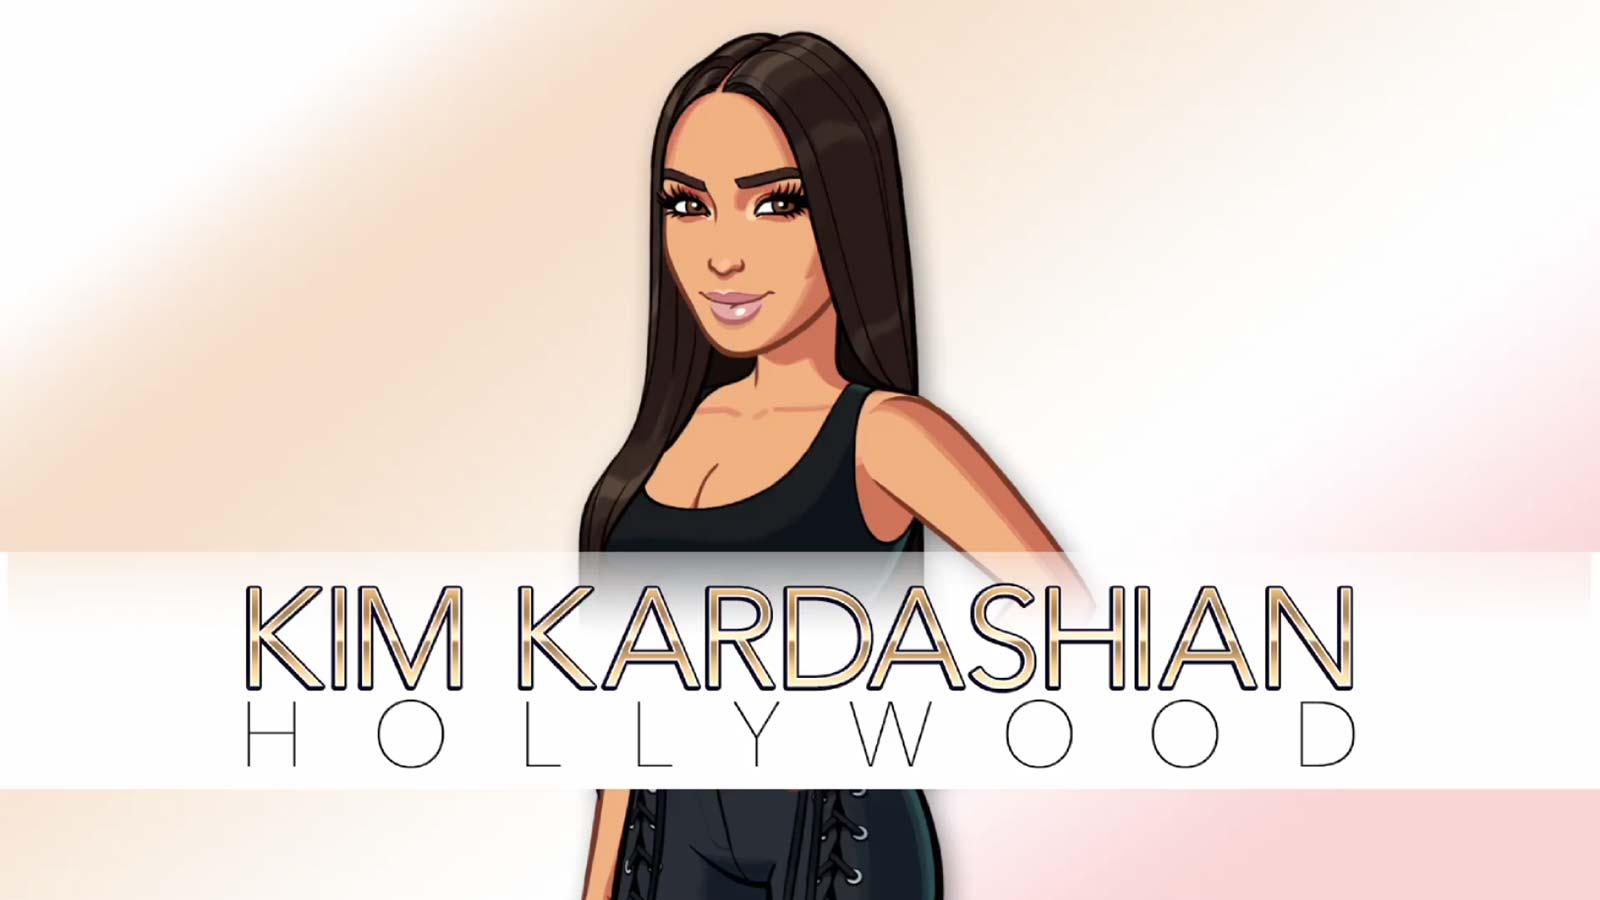 Kim Kardashian: Hollywood++ Download on iOS